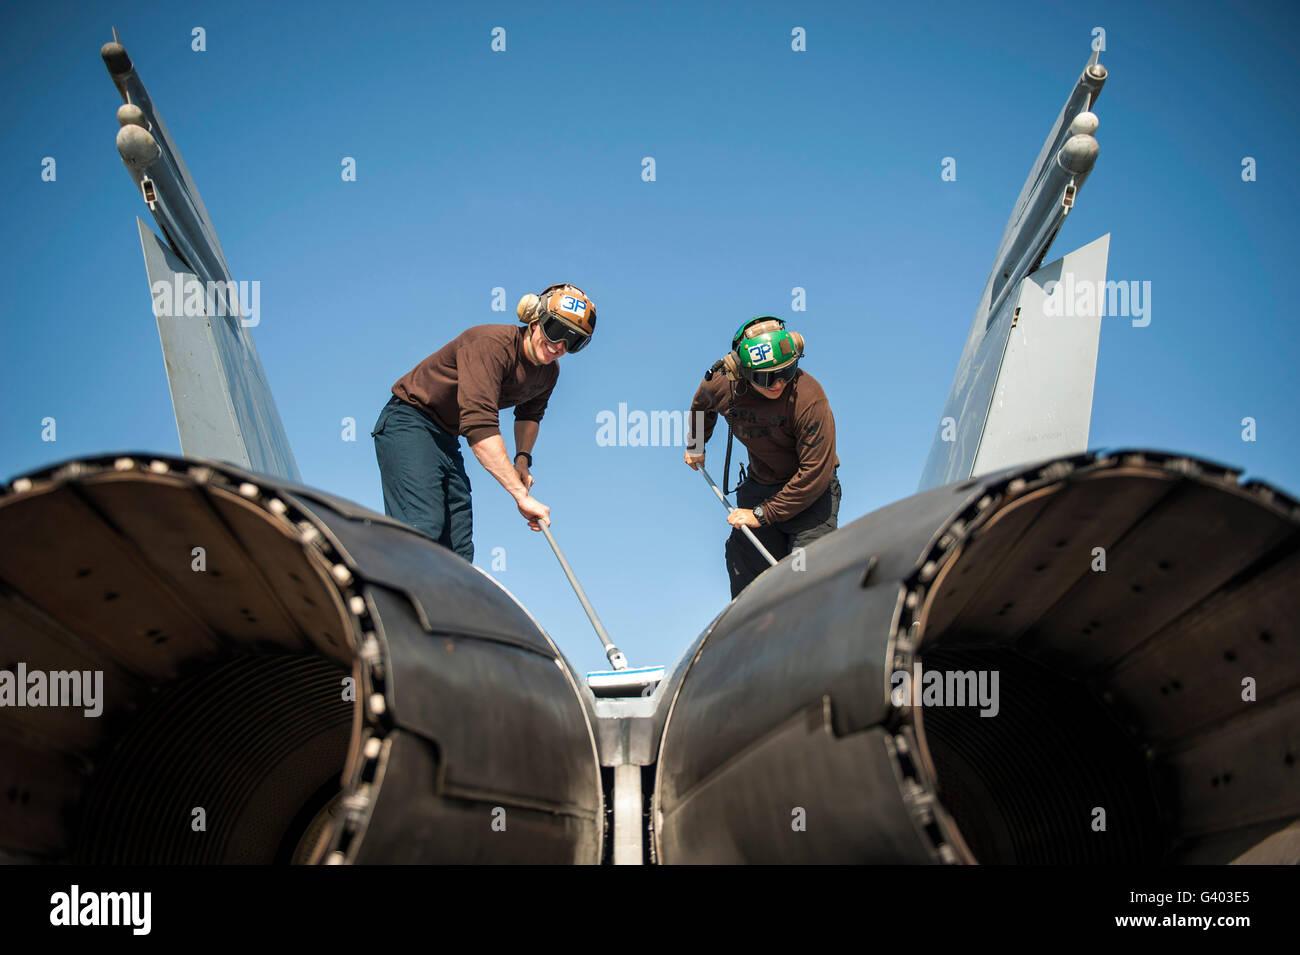 L'Machinistâ Aviation Mates nettoyer un F/A-18C Hornet. Photo Stock